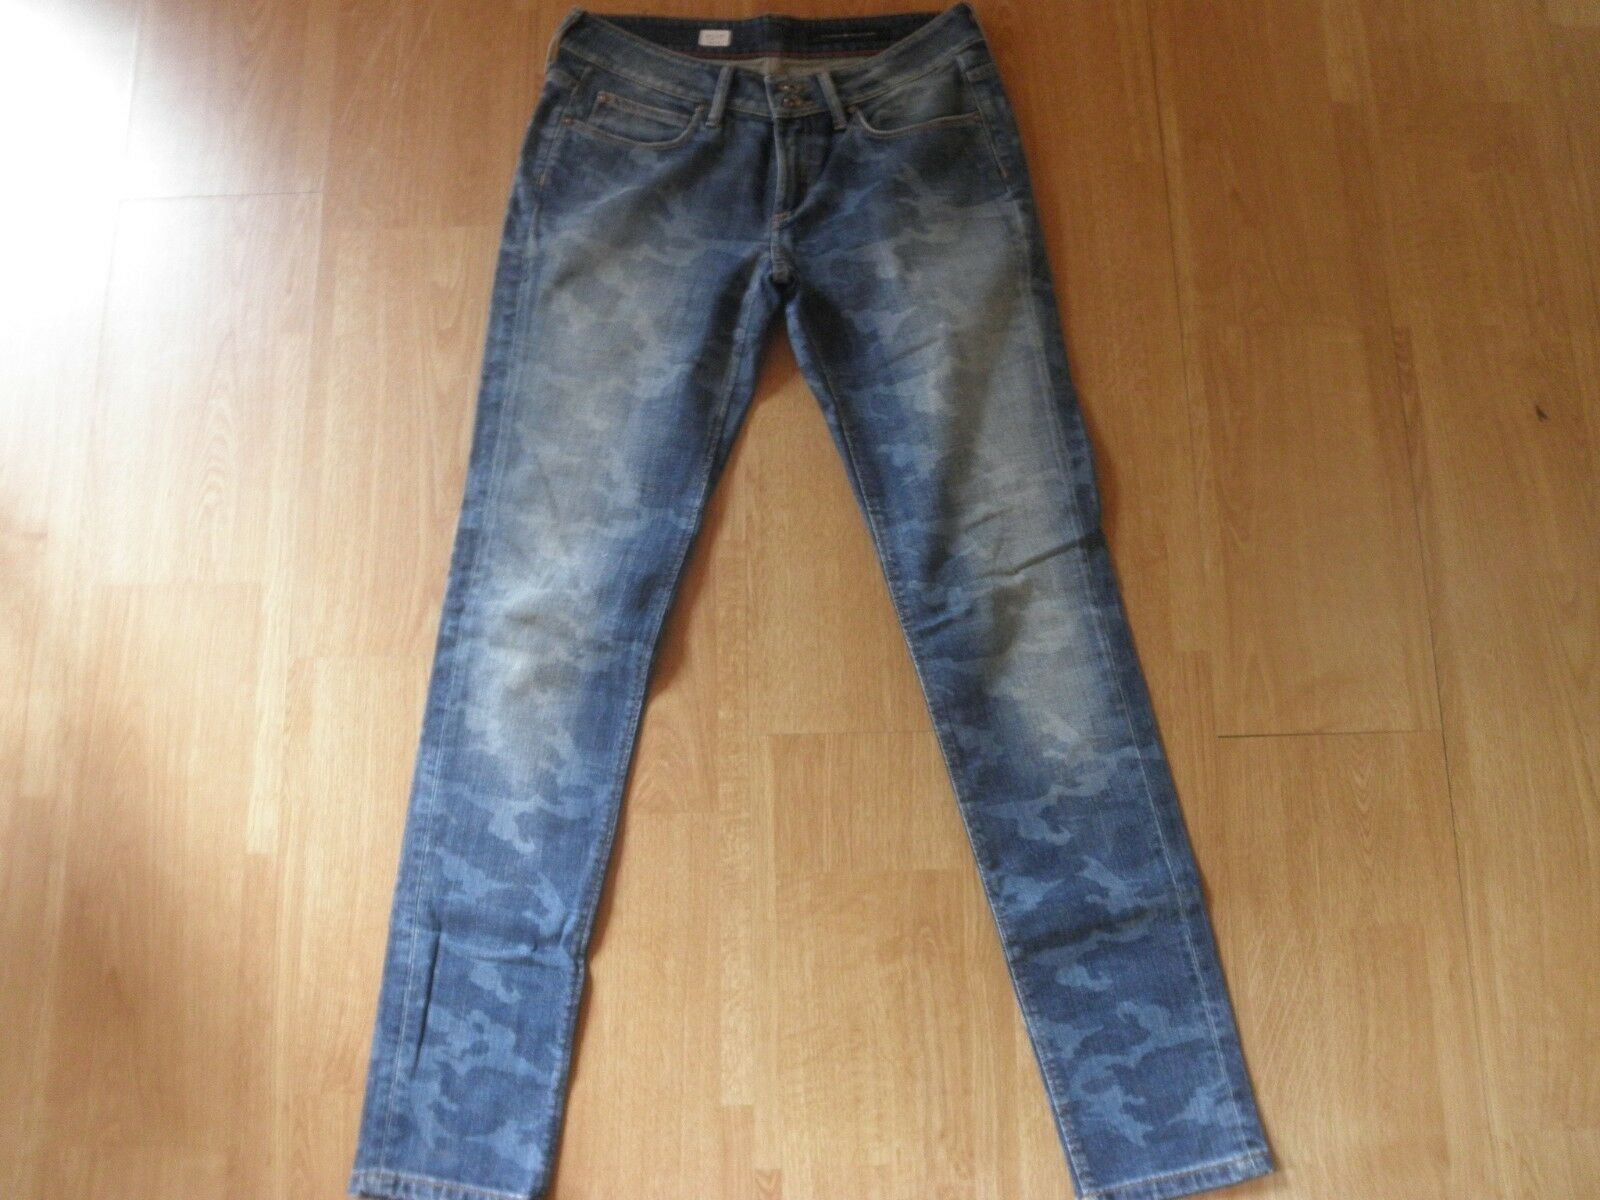 Jeans Tommy HilfigerNEUGr.28 32 Bundweite ca. 39 cm Milan Slim Fit